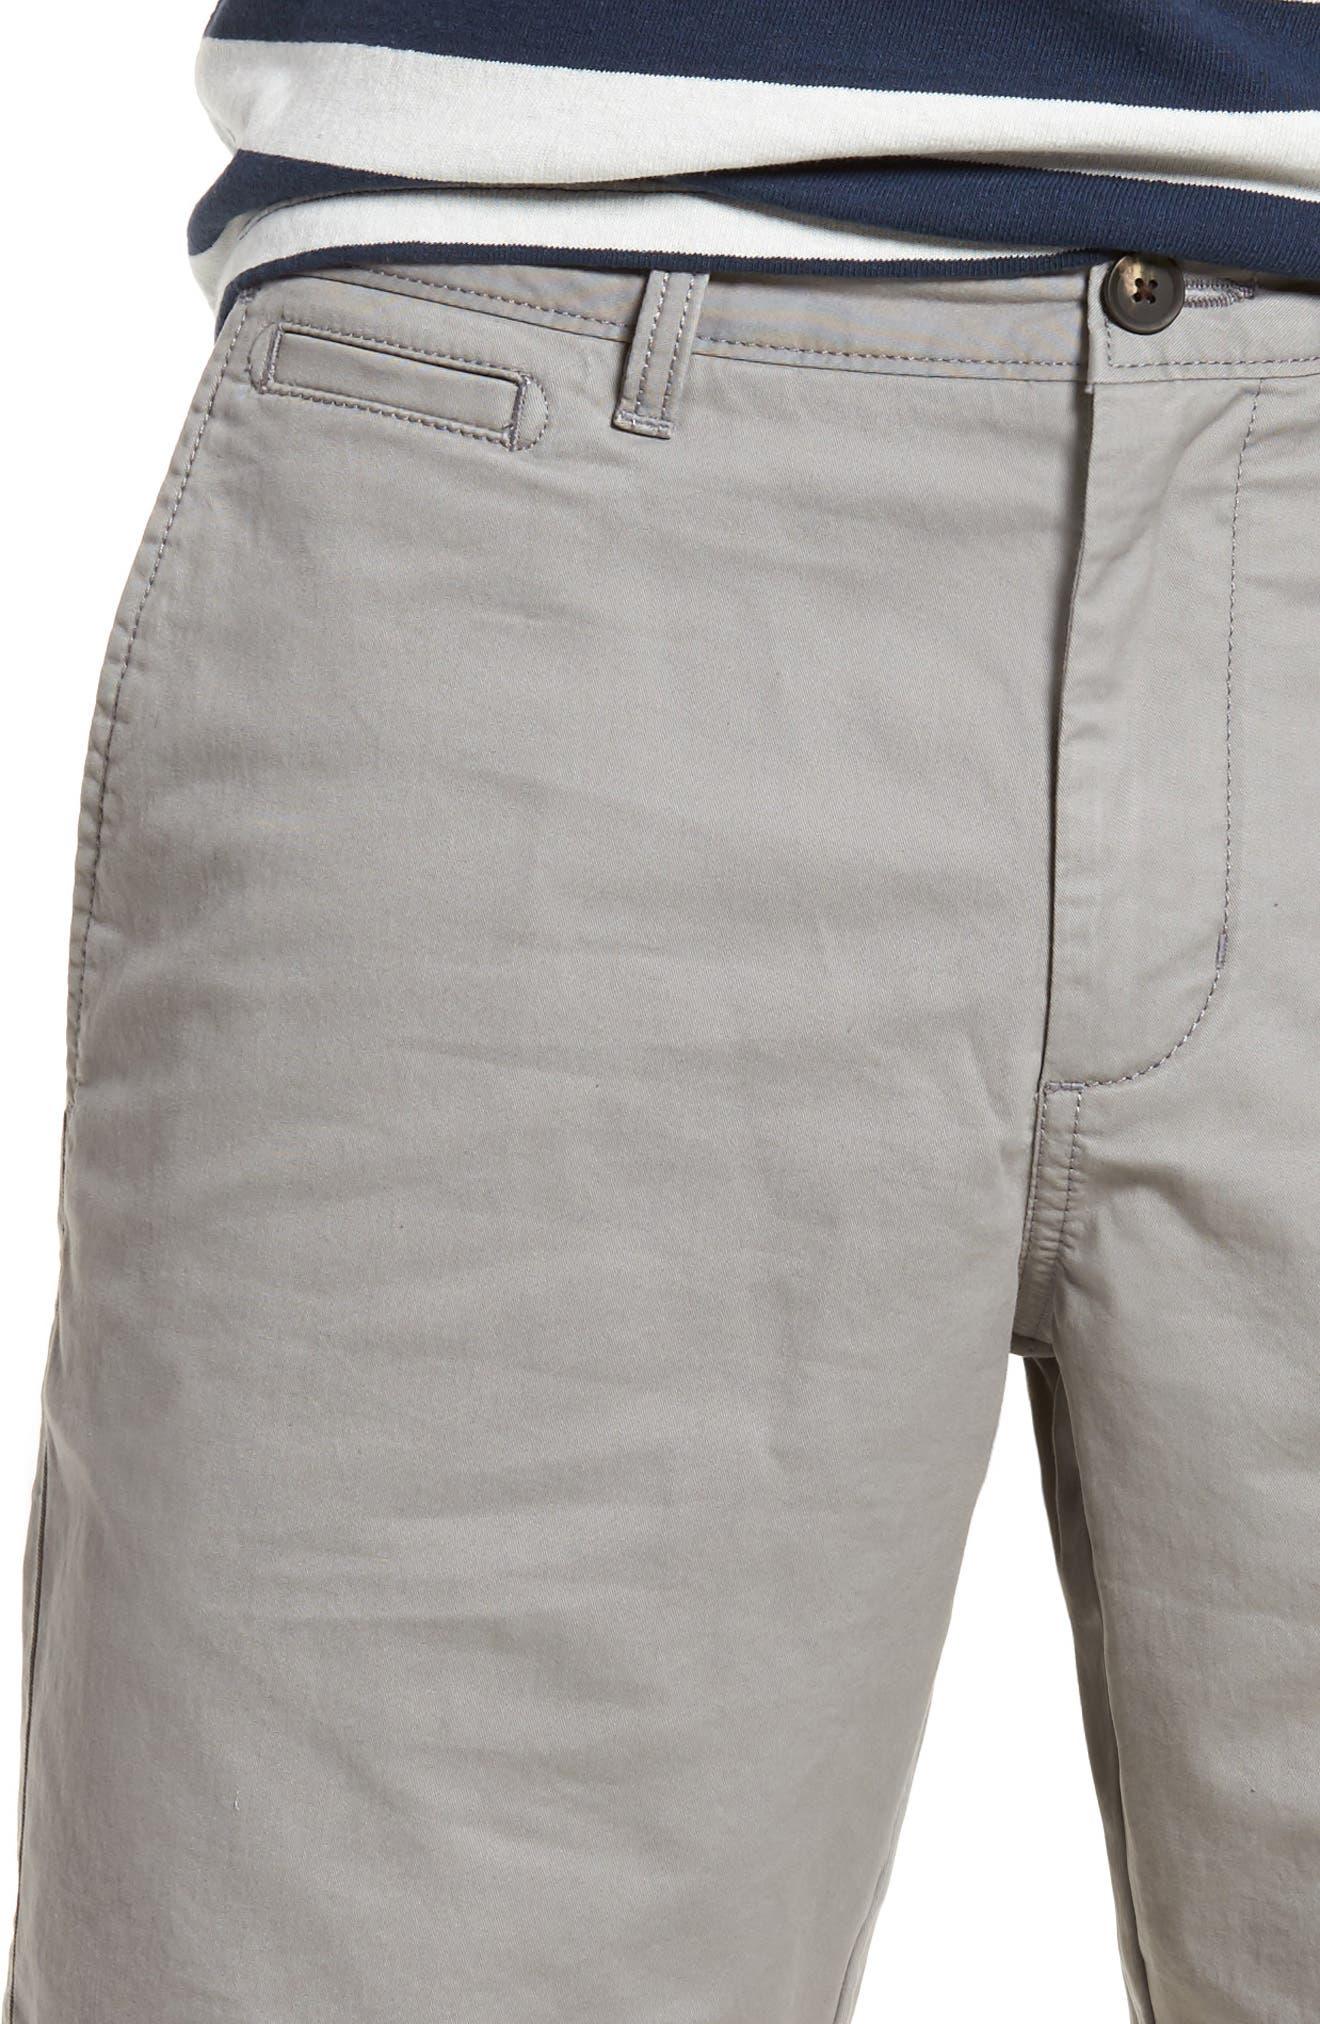 Ballard Slim Fit Stretch Chino 9-Inch Shorts,                             Alternate thumbnail 37, color,